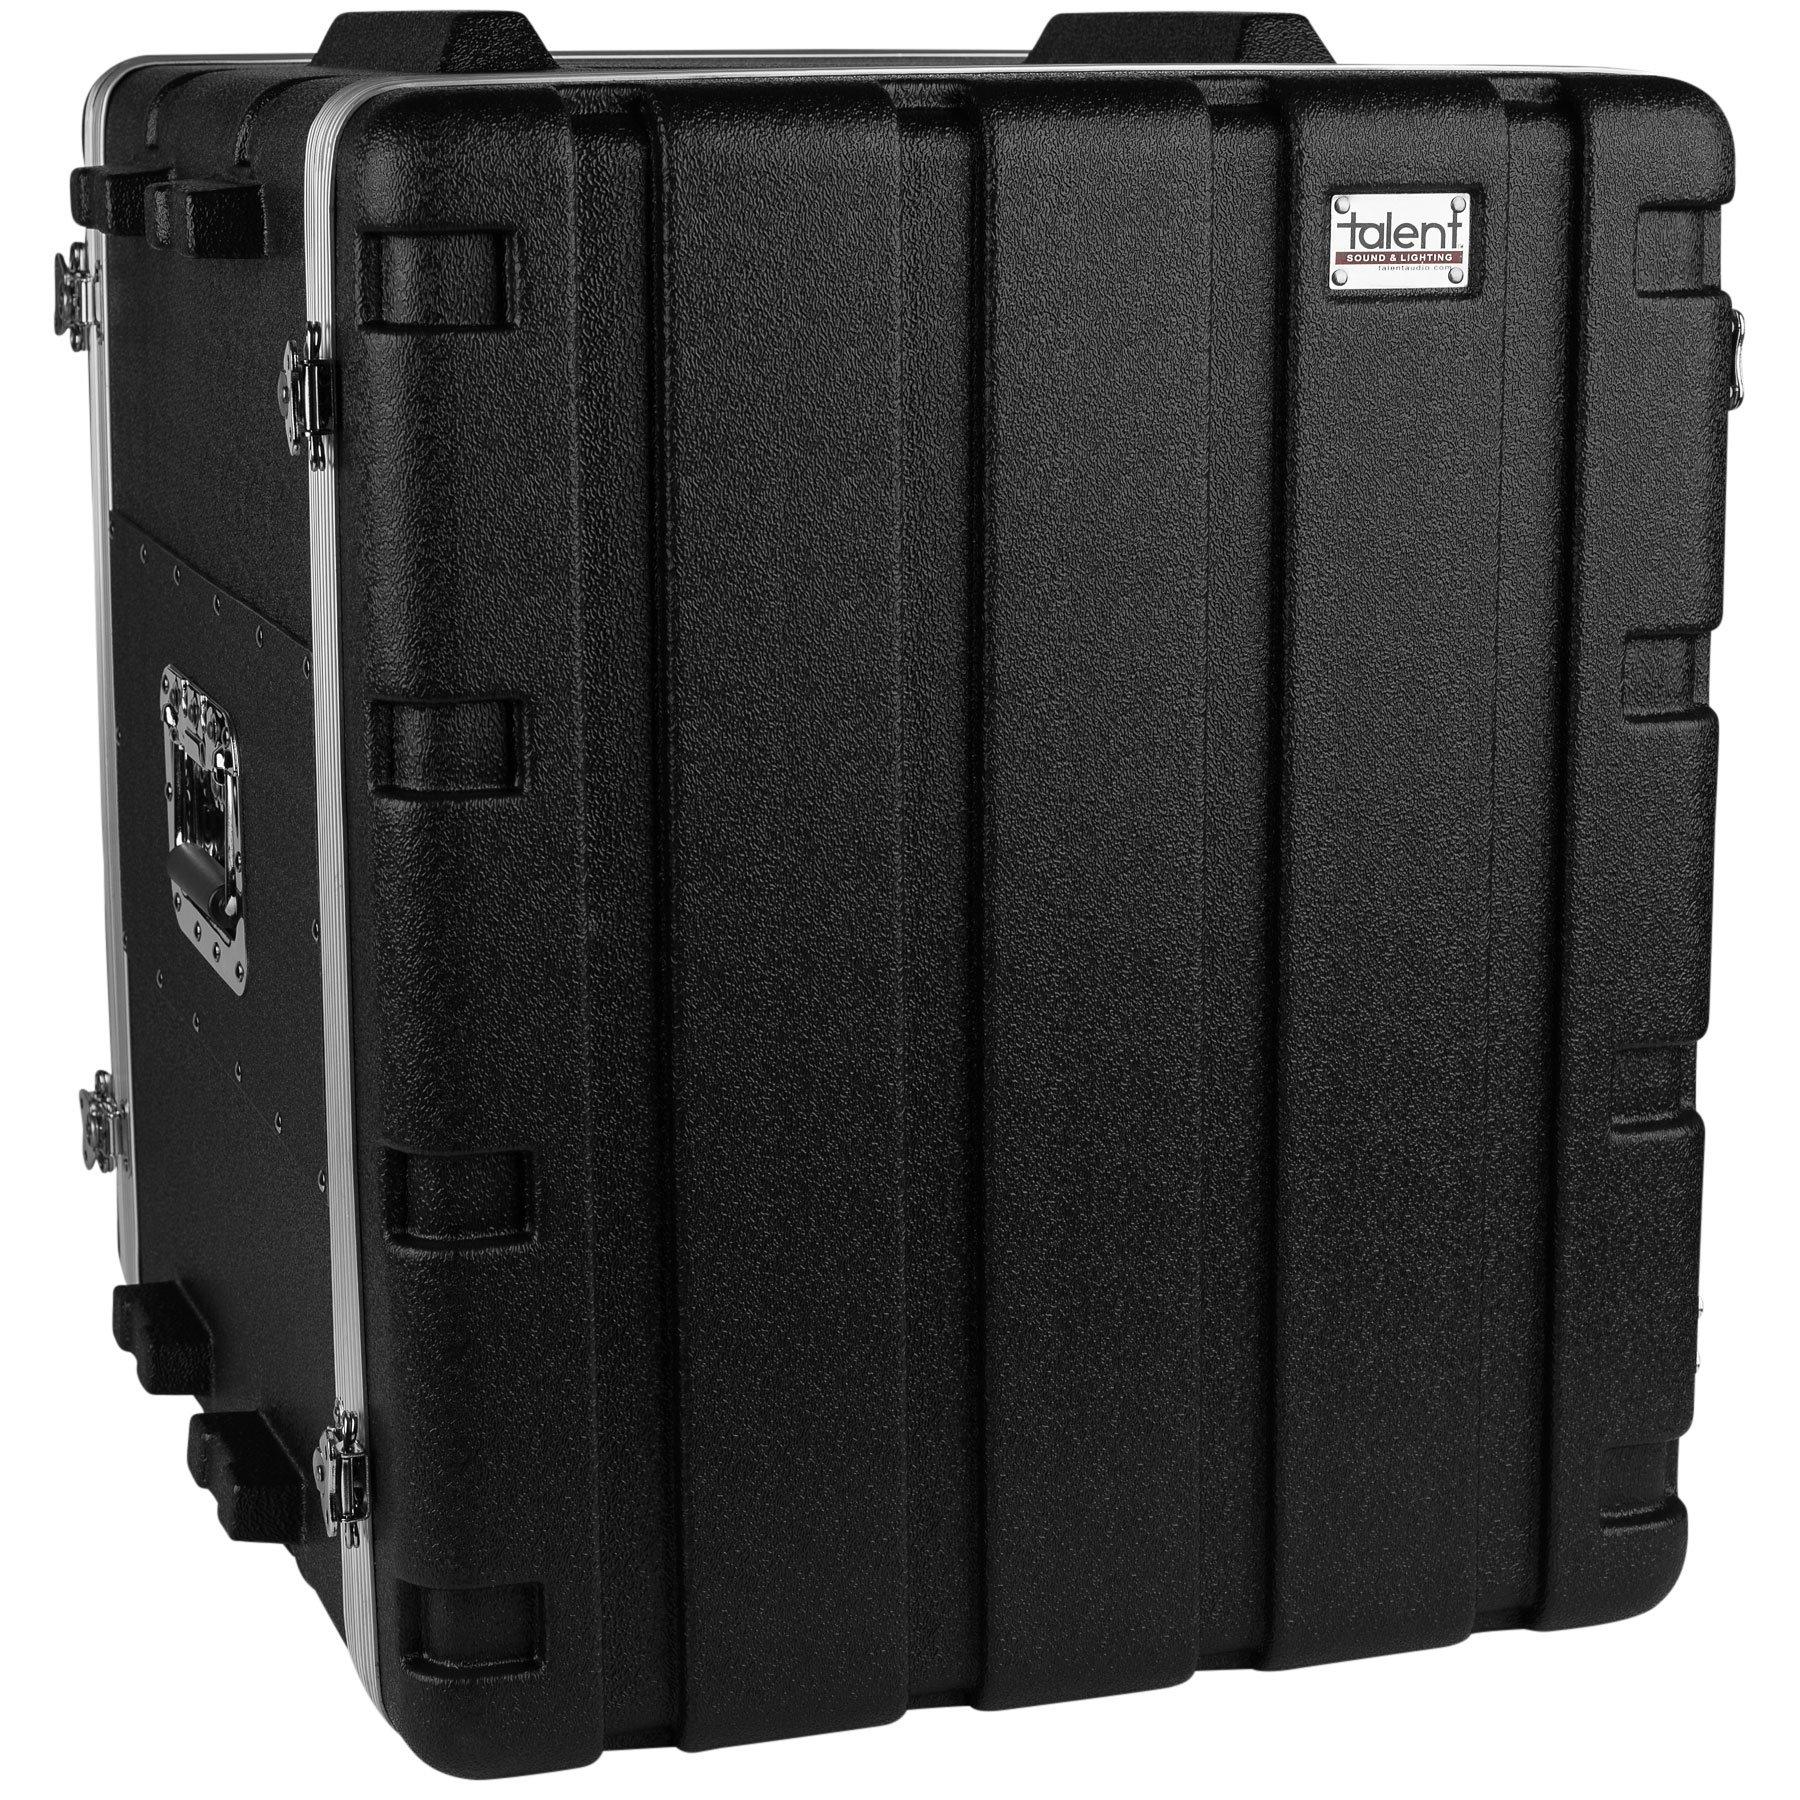 Talent RC12U19 ABS Rack Case 12U 19'' Depth